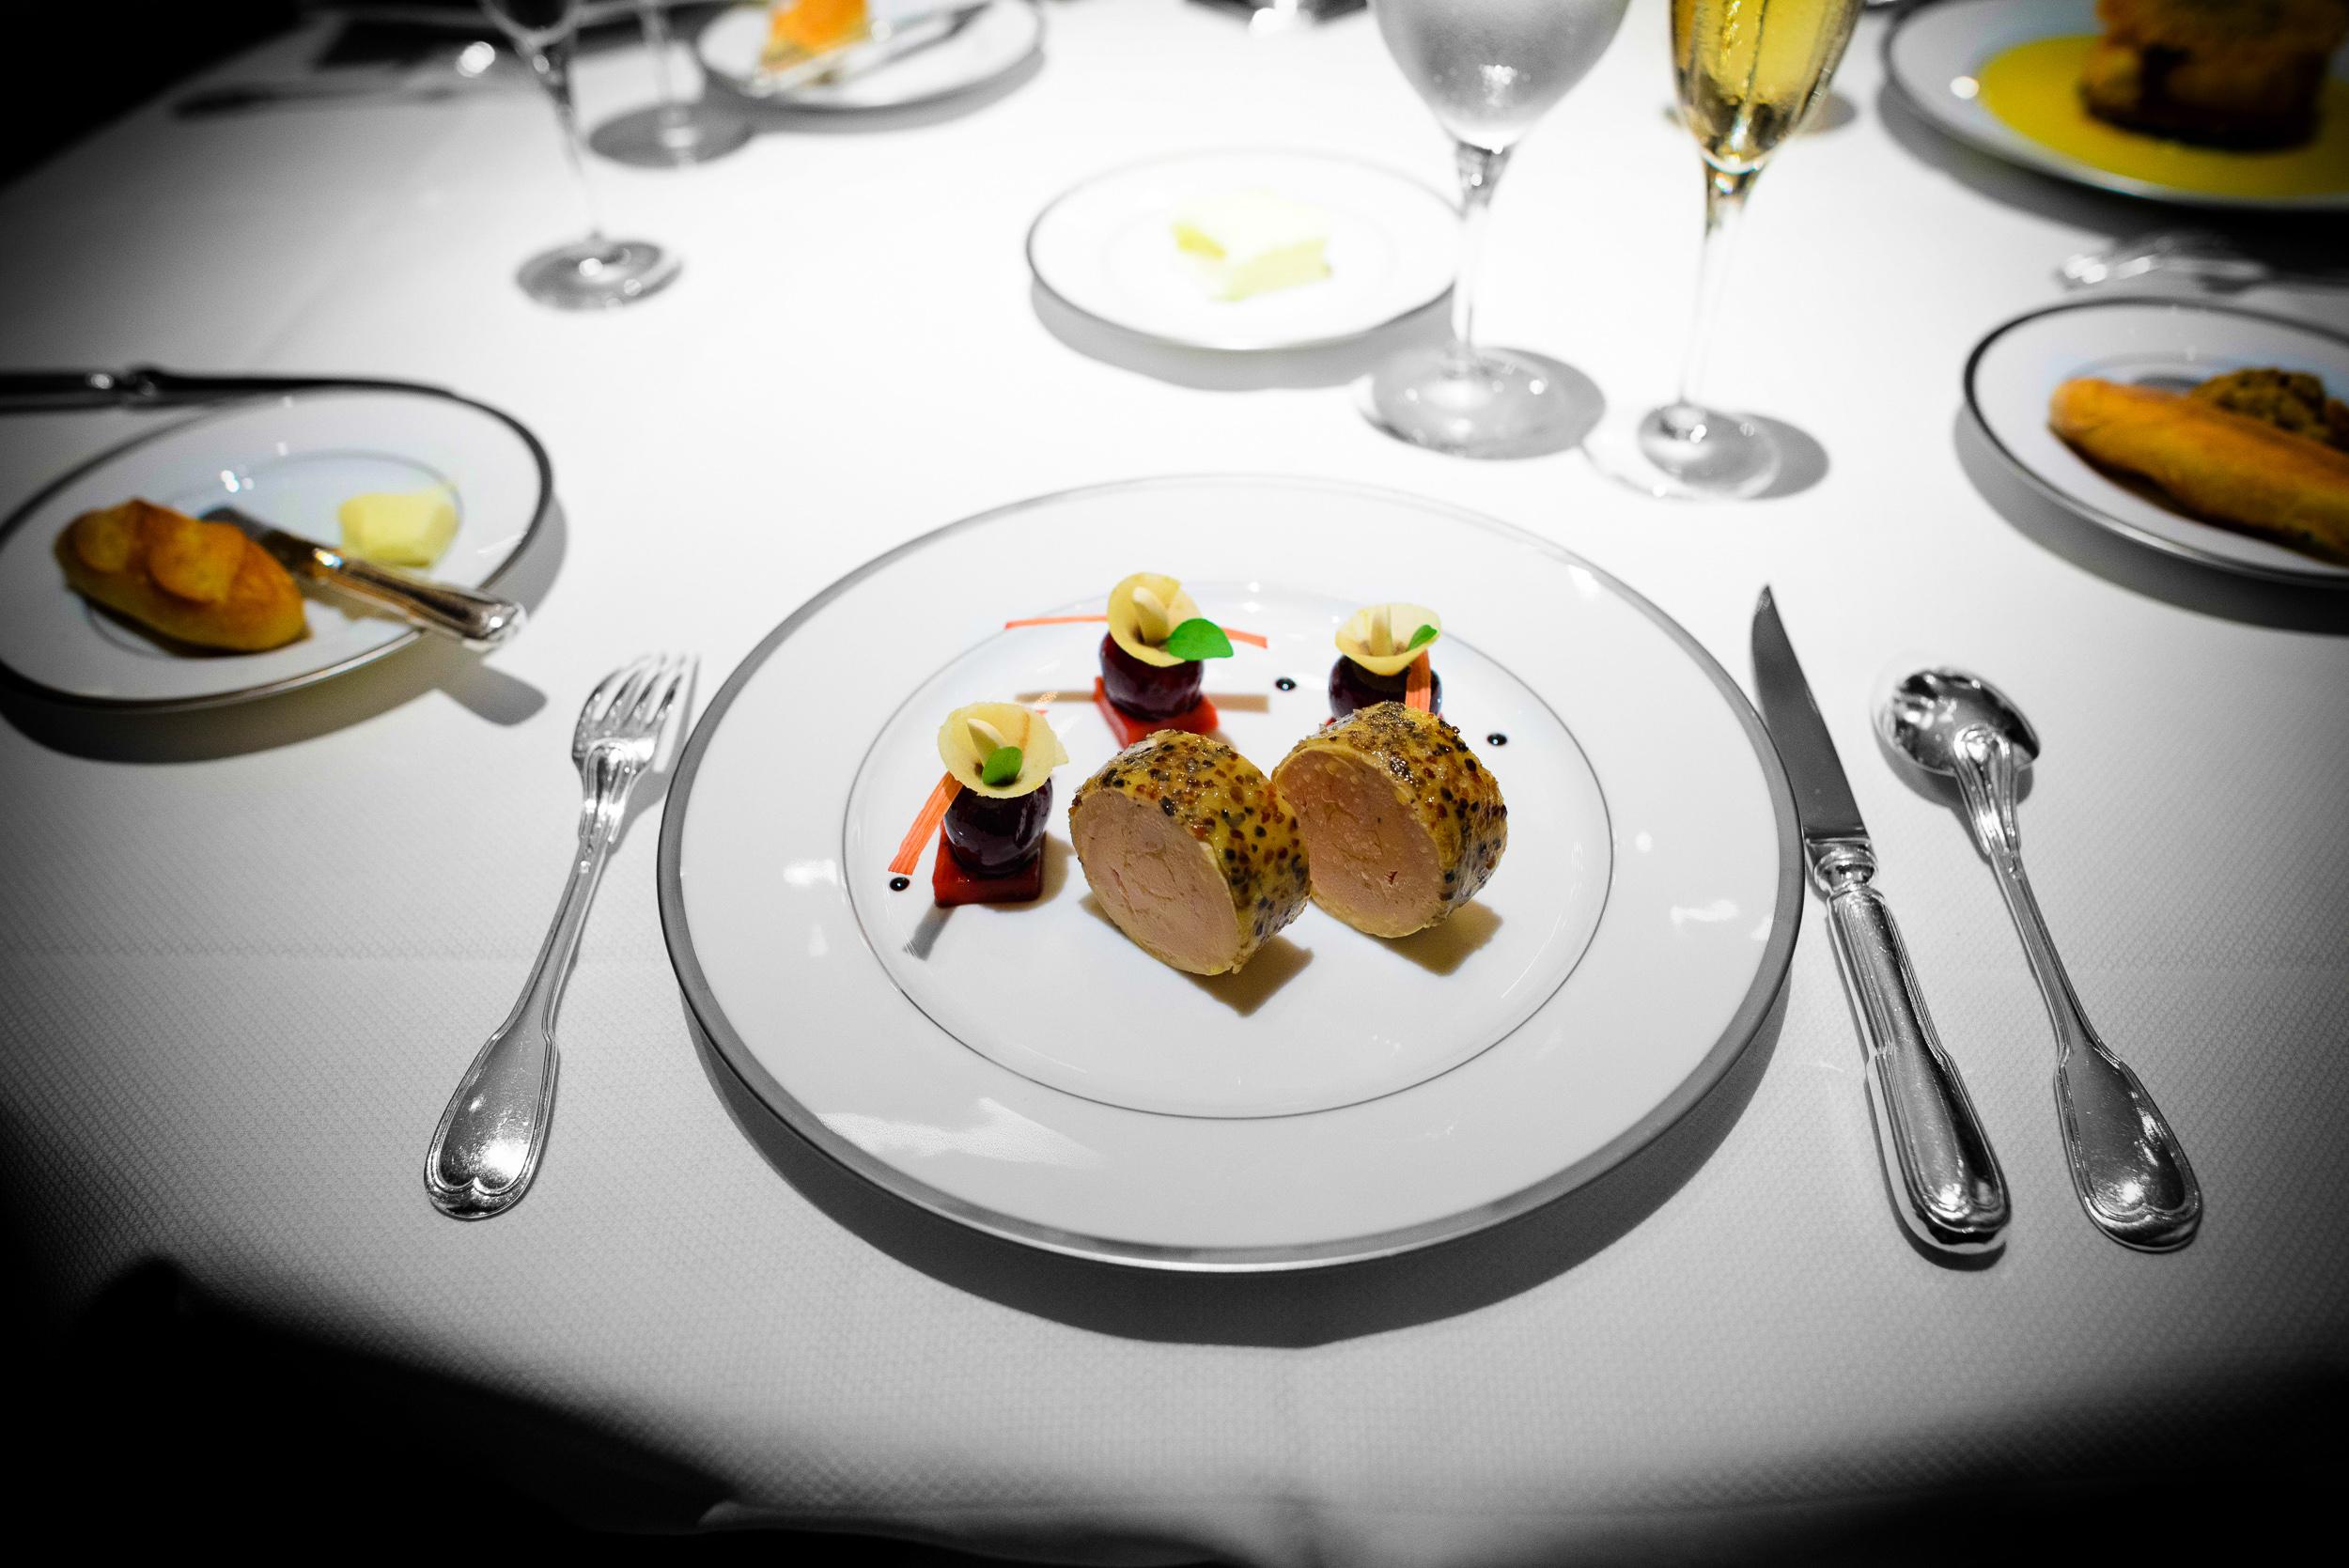 Lobe de foie gras de canard landais en croûte de poivre, duo de